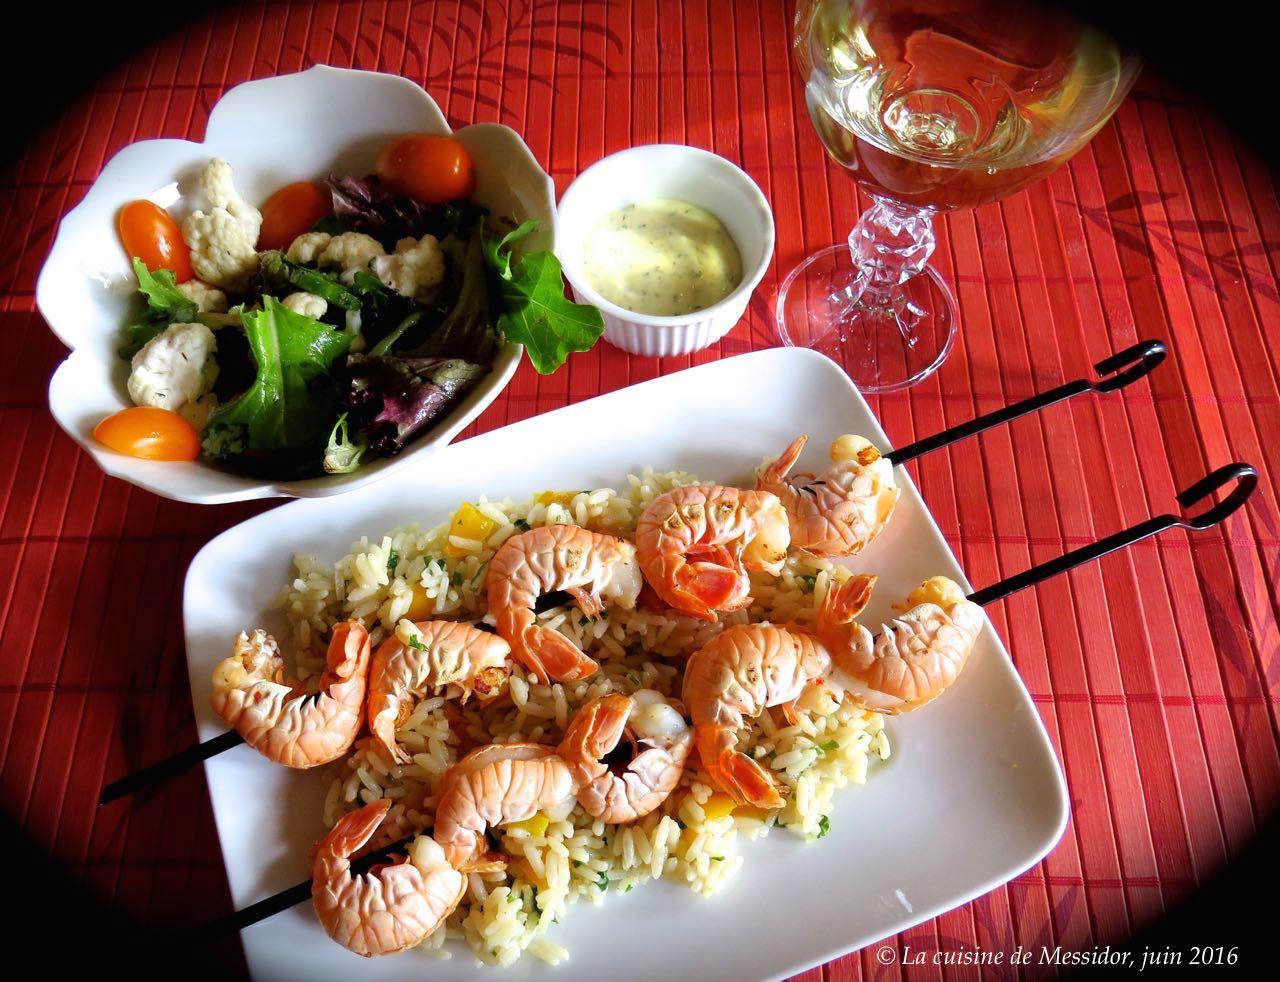 La cuisine de messidor repas de langoustines bbq la for Repas de cuisine